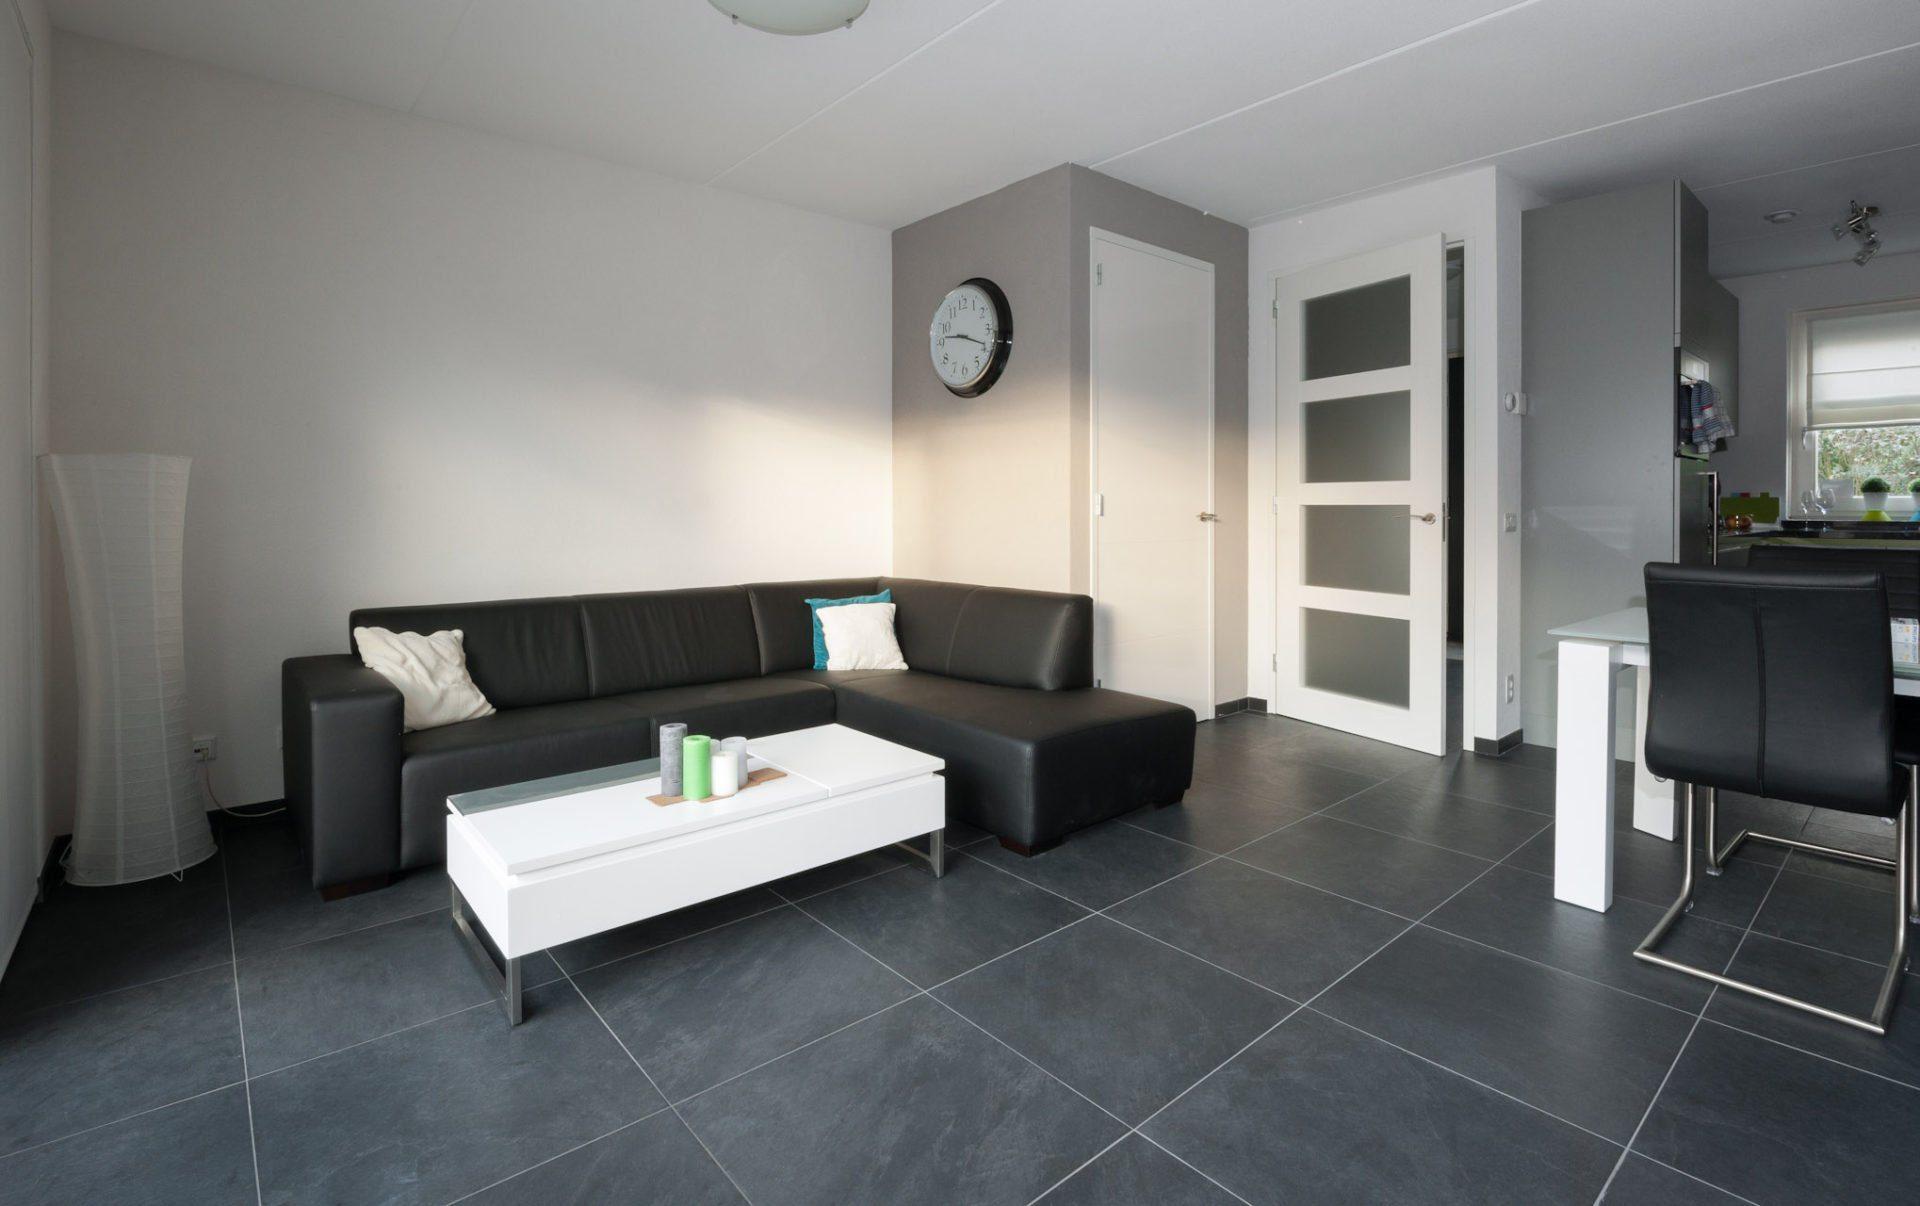 Antraciet vloertegels in woonkamer en badkamer for Grijze woonkamer